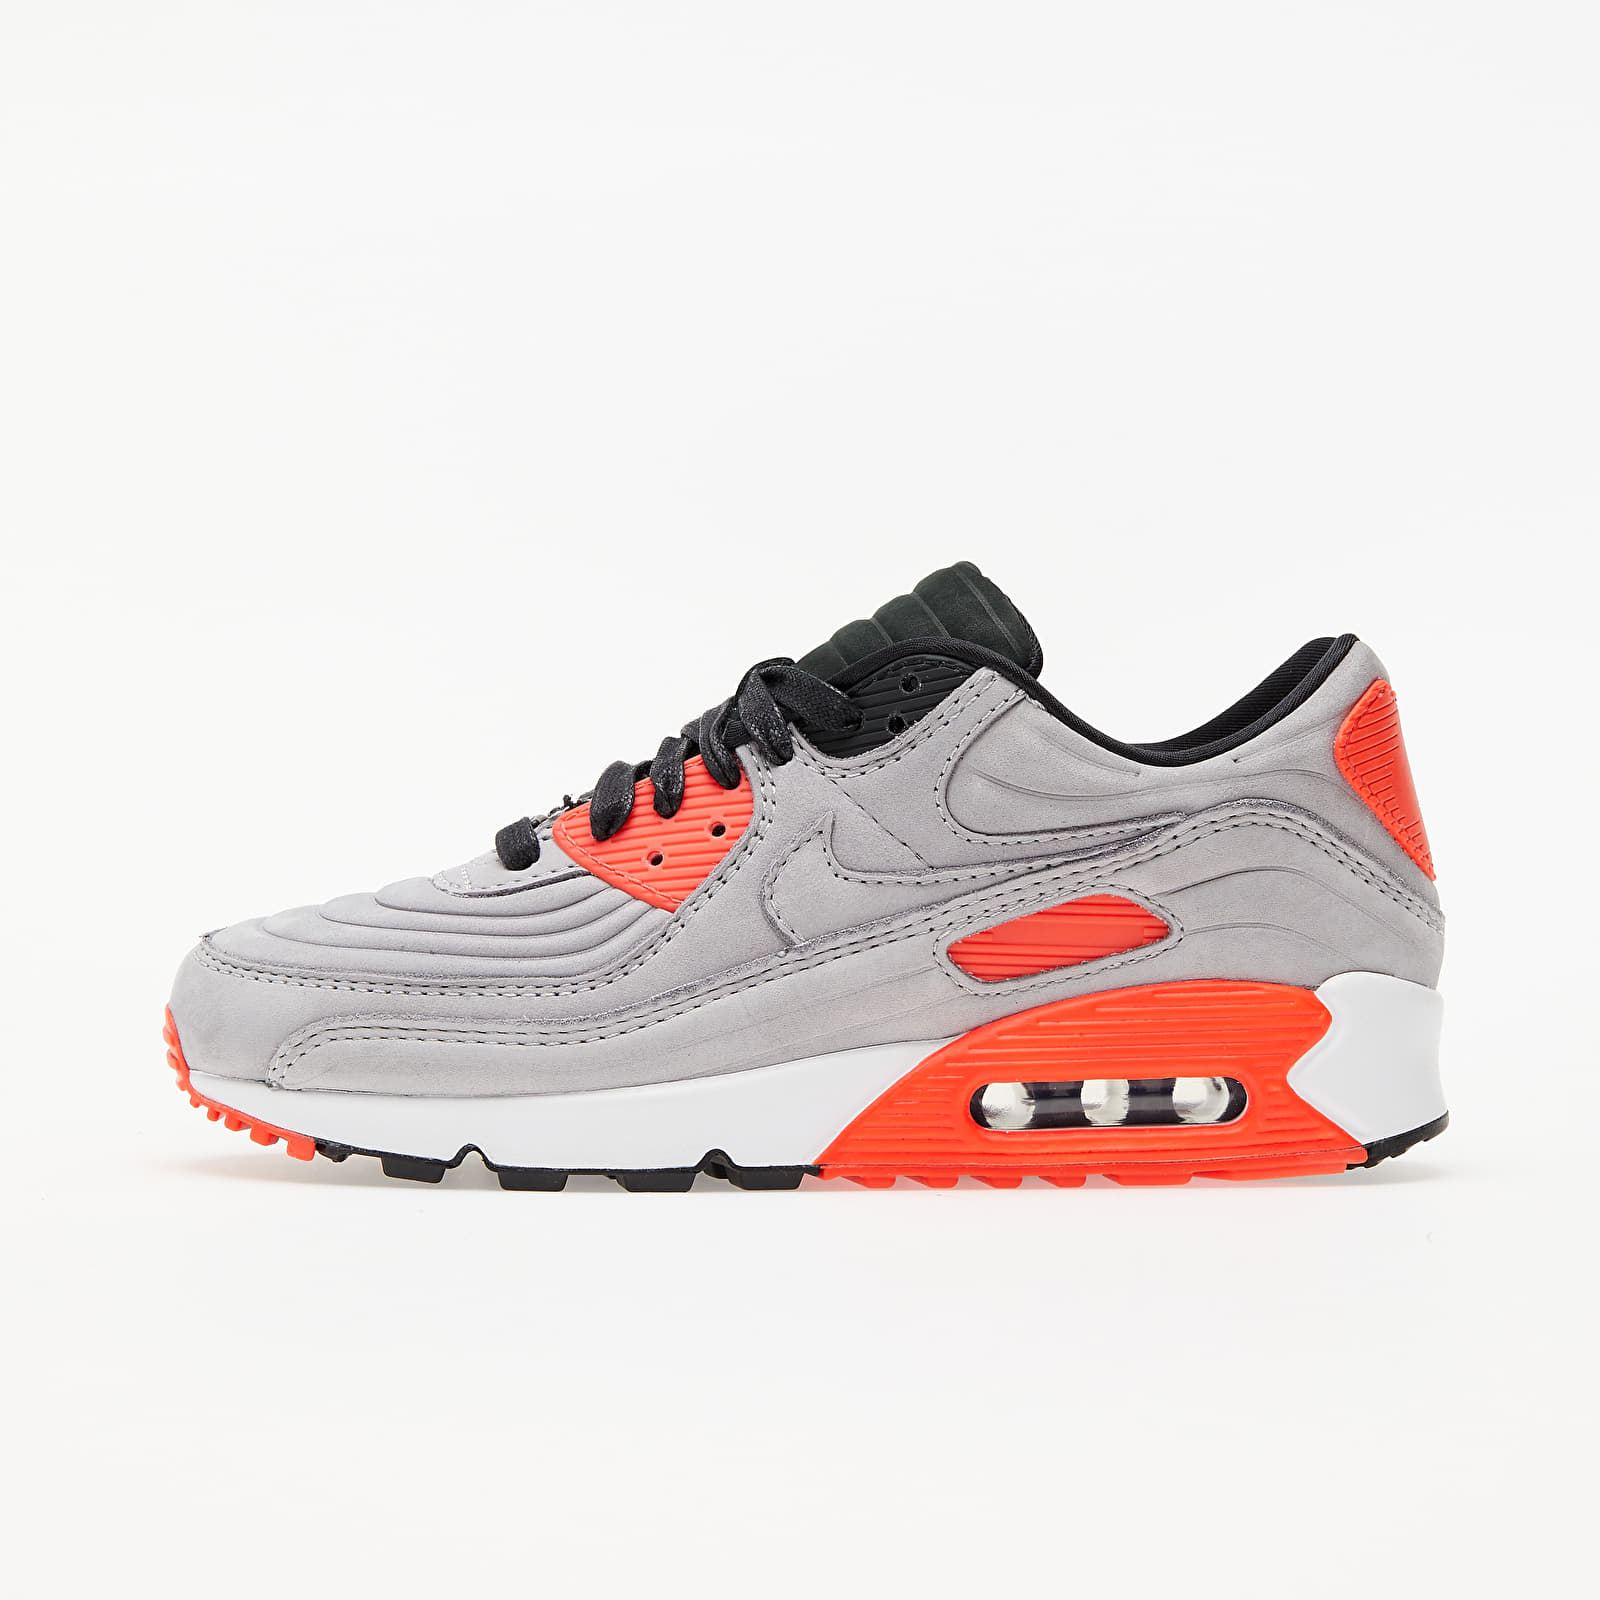 Încălțăminte și sneakerși pentru bărbați Nike Air Max 90 QS Night Silver/ Night Silver-Bright Crimson